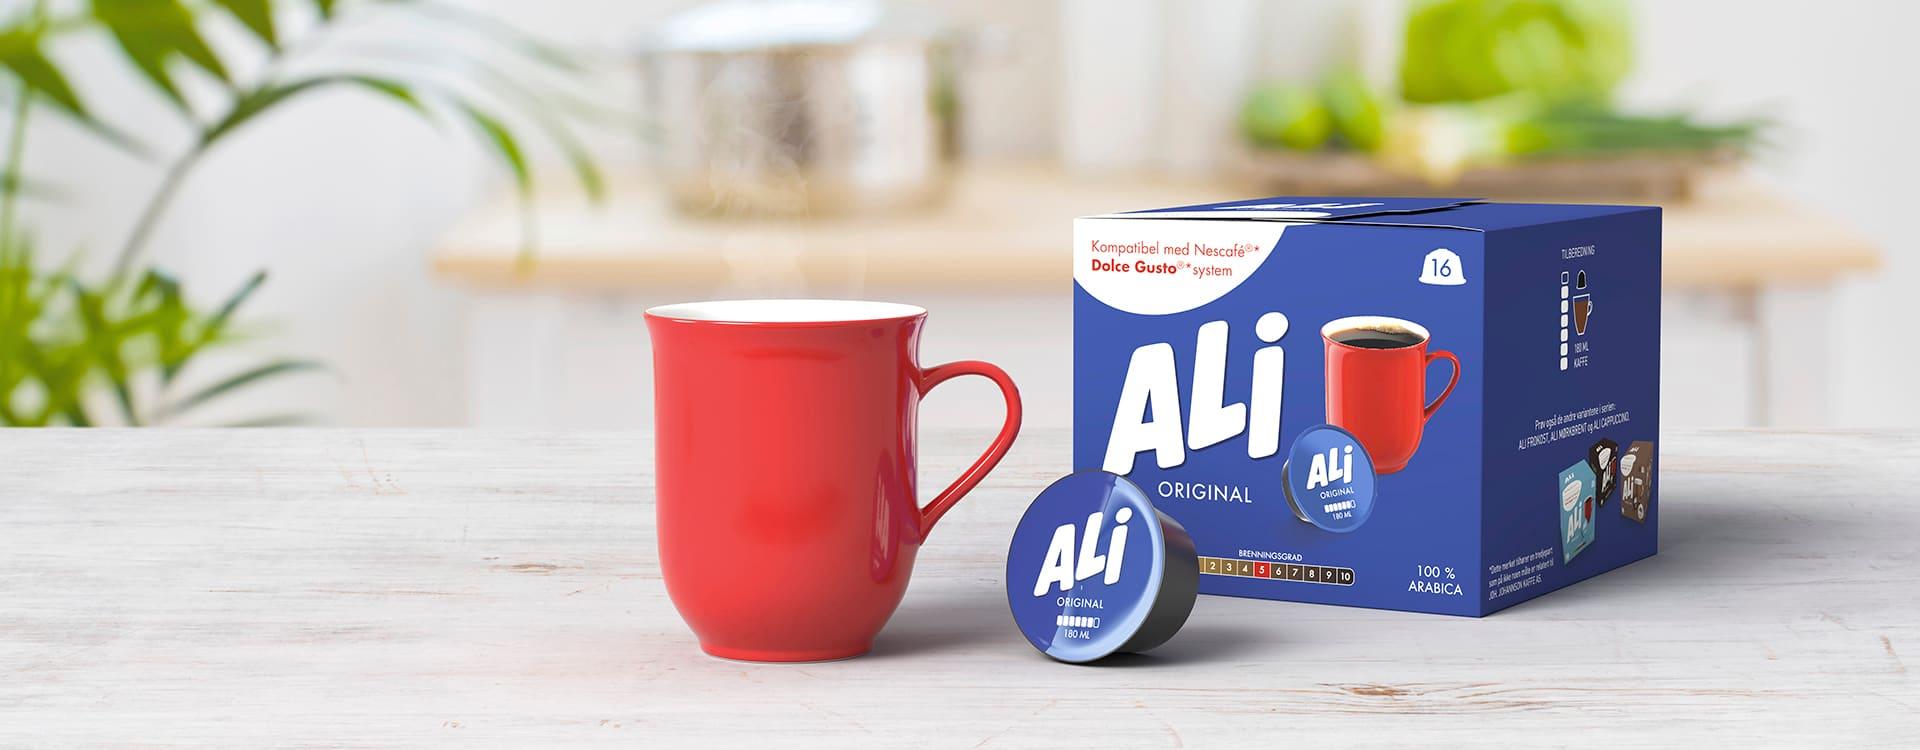 ALI Original kaffekapsler.